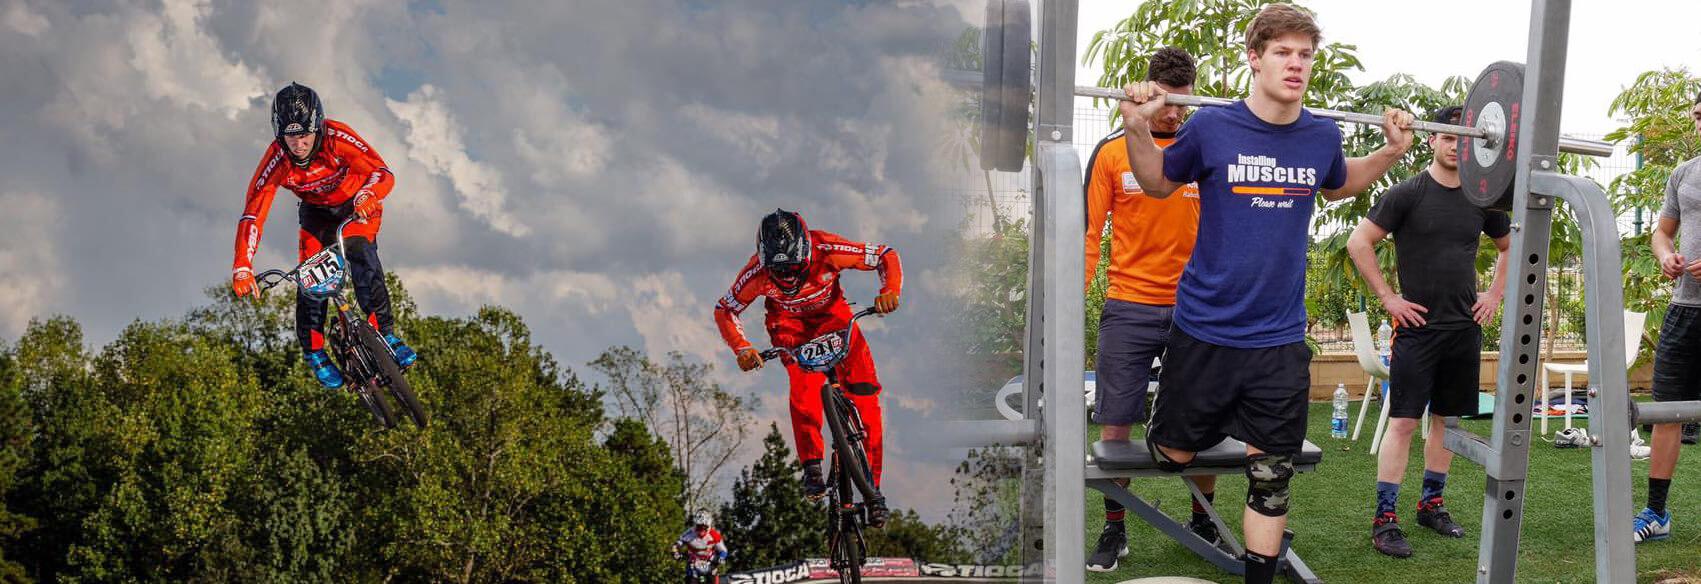 Dutch Talent Team Spain 2017 Justin Kimmann